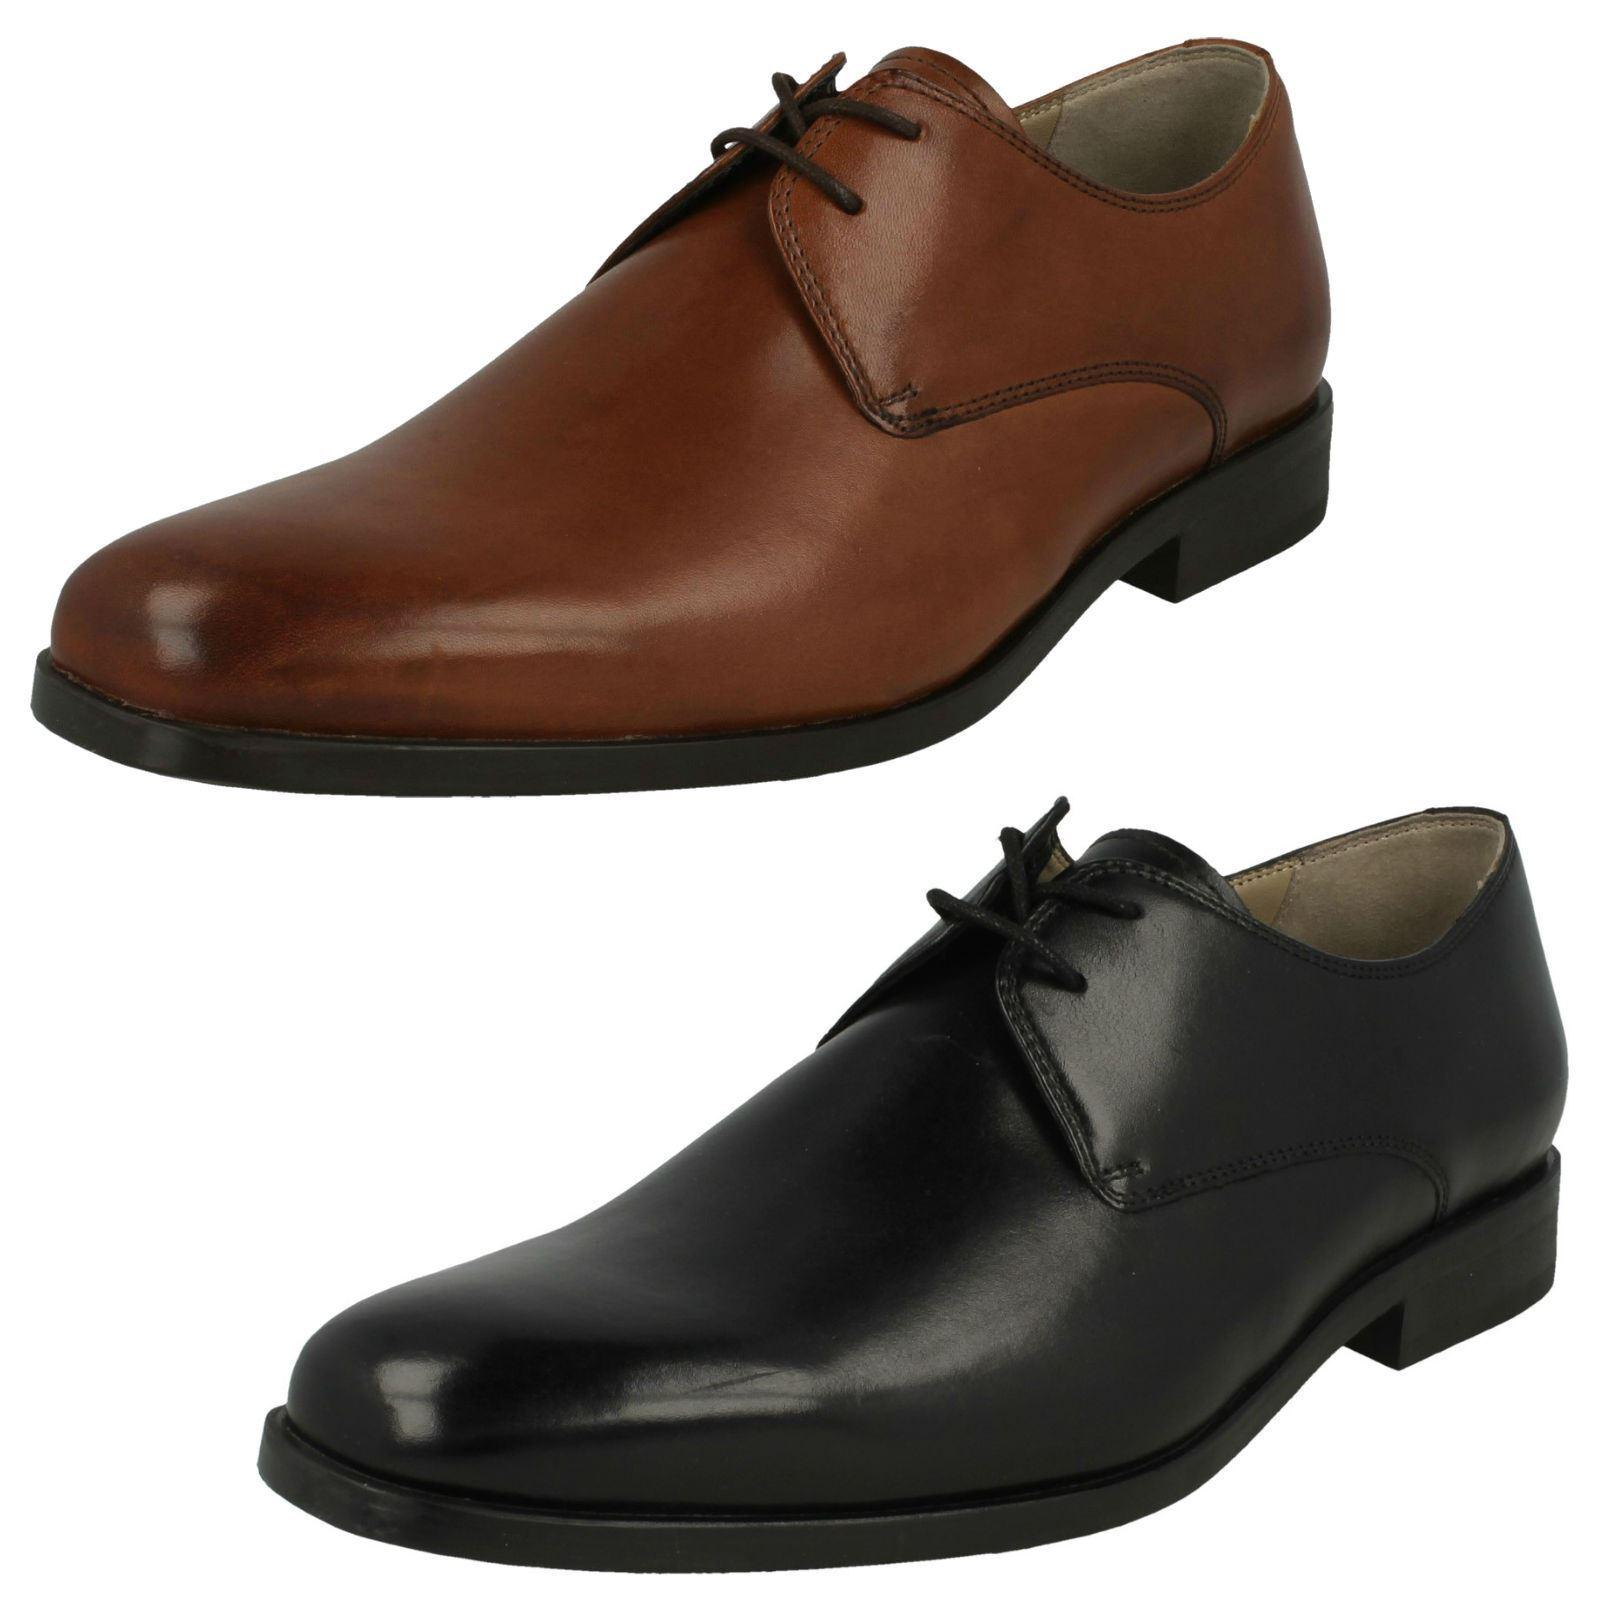 Mens Clarks Formal Walk Lace Up Shoes Amieson Walk Formal c438da